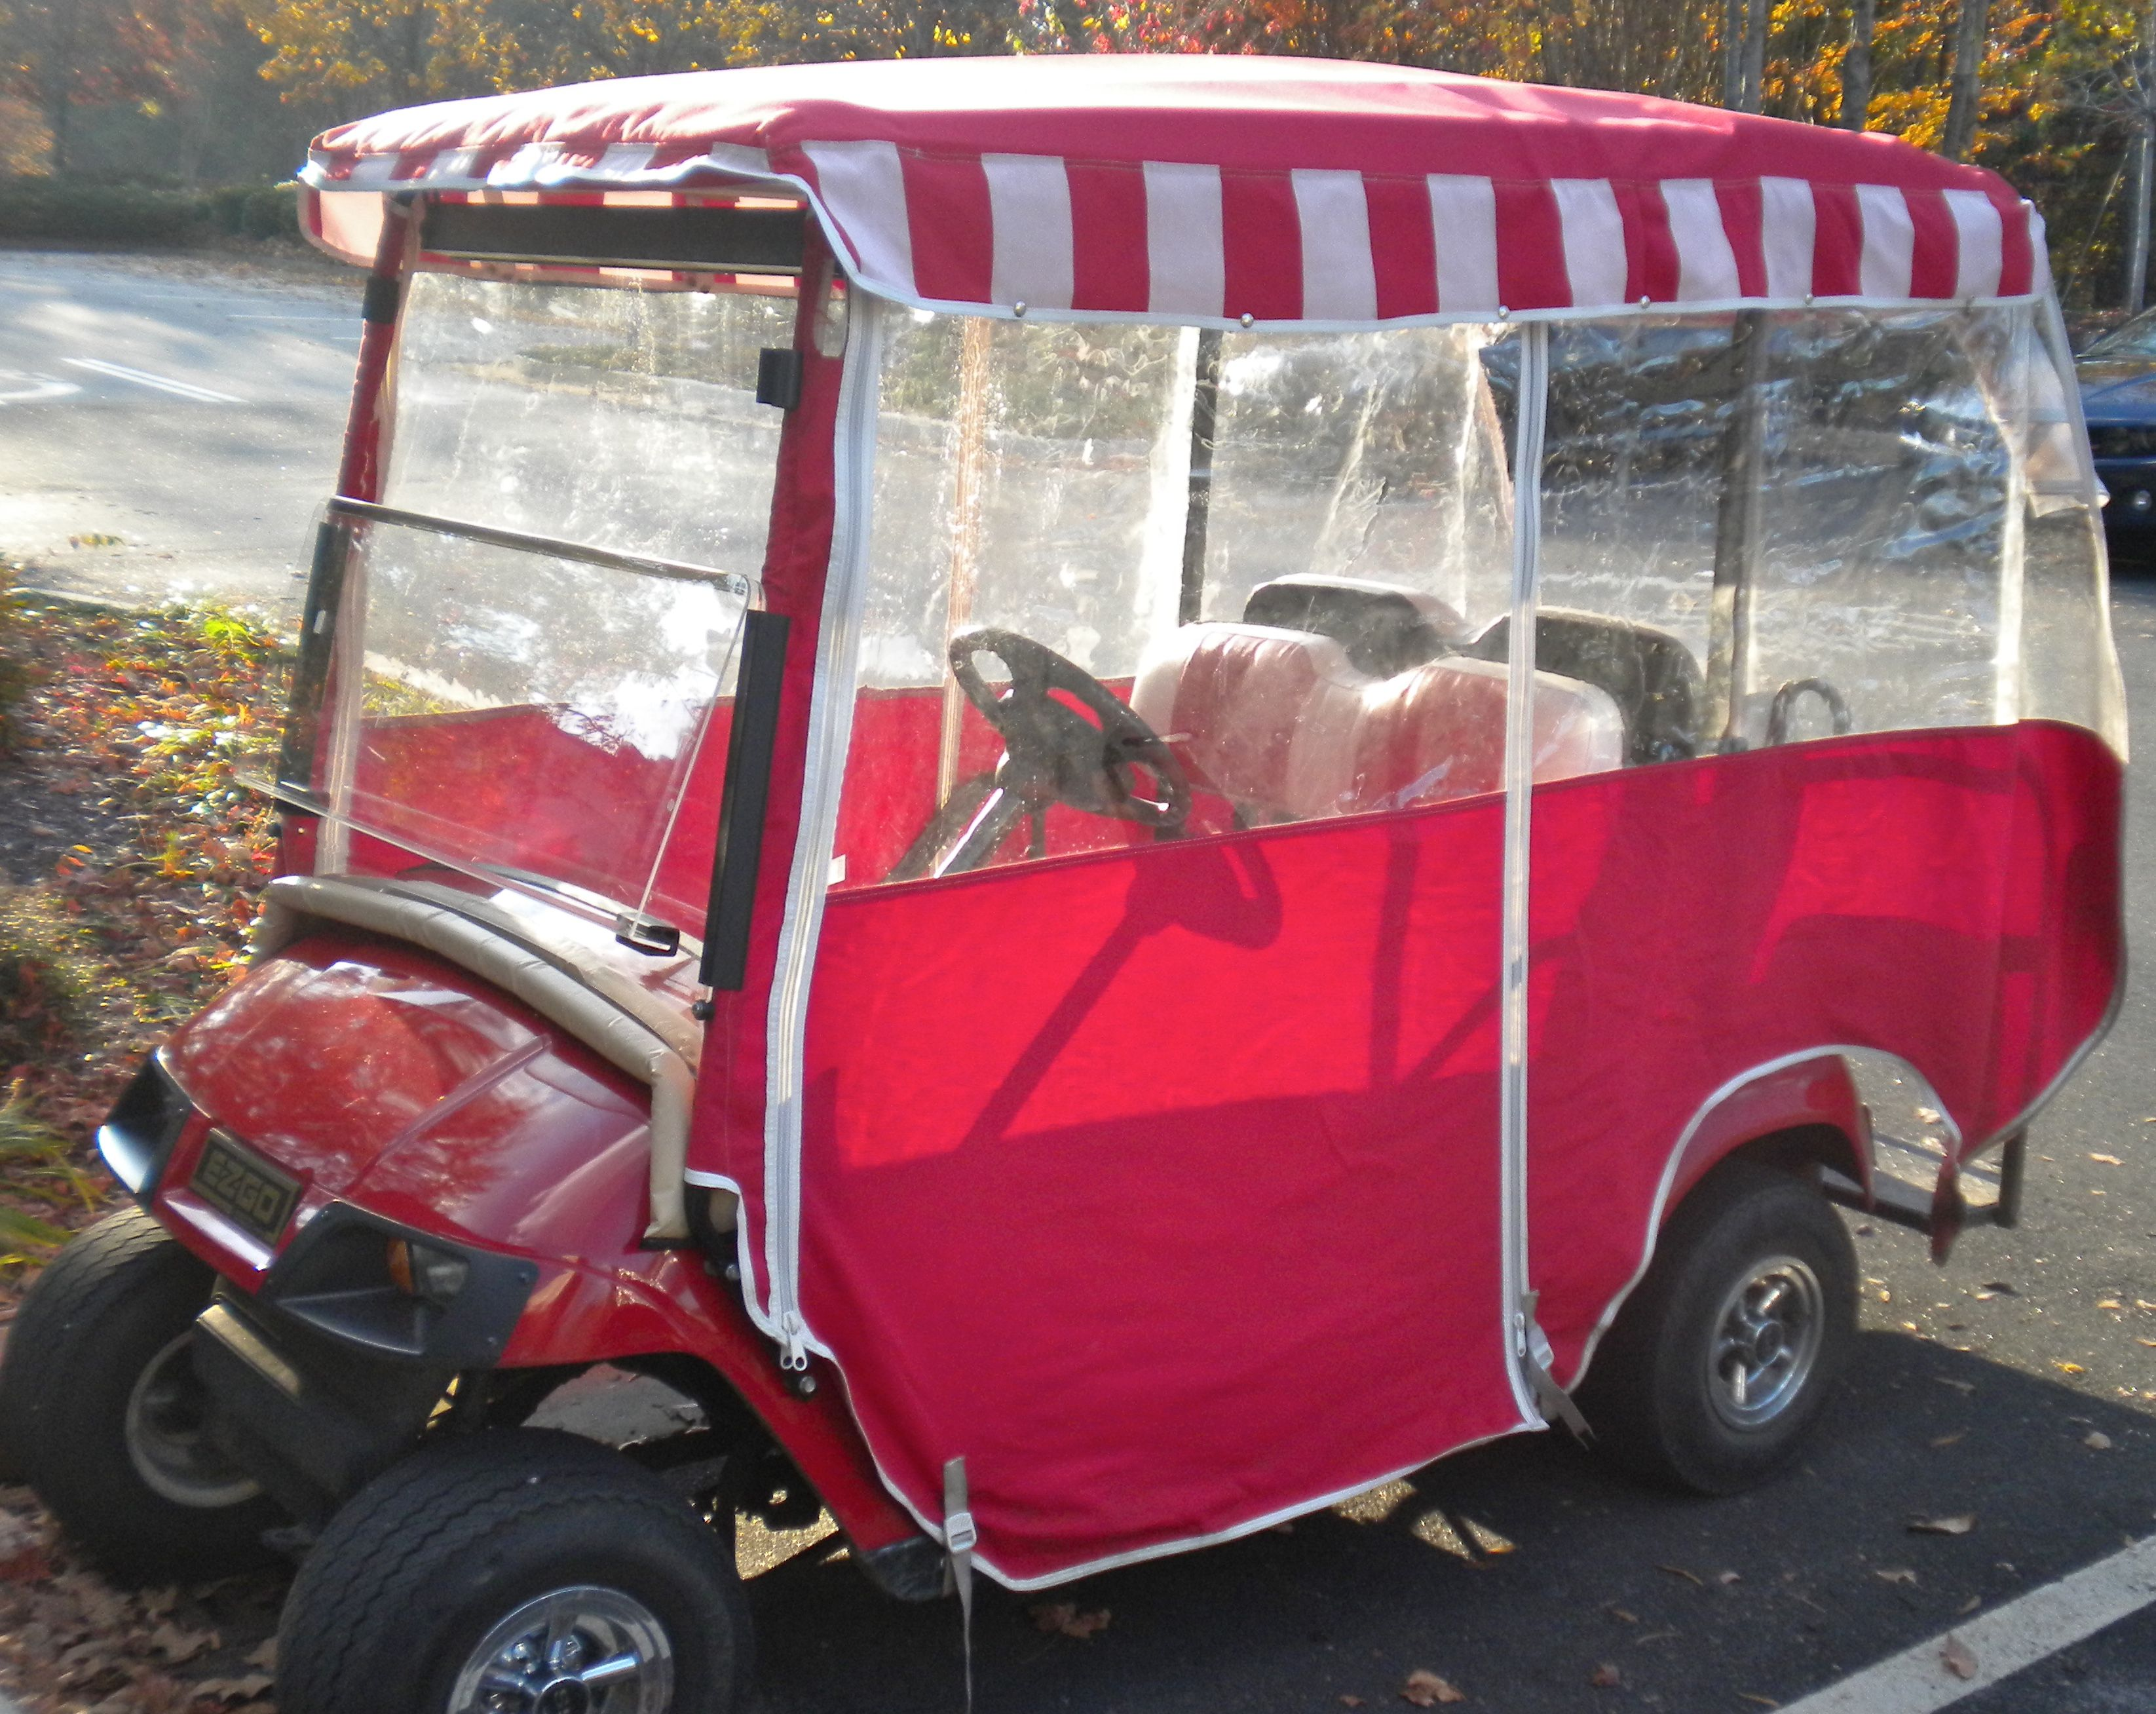 EZGO Golf Cart Accessories for Style, Comfort, & Customizing | EZGO Green Line Golf Cart Sunbrella Cover on national golf cart covers, canvas golf cart covers, classic golf cart covers, golf cart canopy covers, vinyl golf cart covers, star golf cart covers, door works golf cart covers, club car golf cart rain covers, buggies unlimited golf cart covers, clear plastic golf cart covers, custom golf cart covers, discount golf cart covers, sam's club golf cart covers, rail golf cart covers, portable golf cart covers, golf cart cloth seat covers, eevelle golf cart covers, 3 sided golf cart covers, yamaha golf cart covers, harley golf cart seat covers,